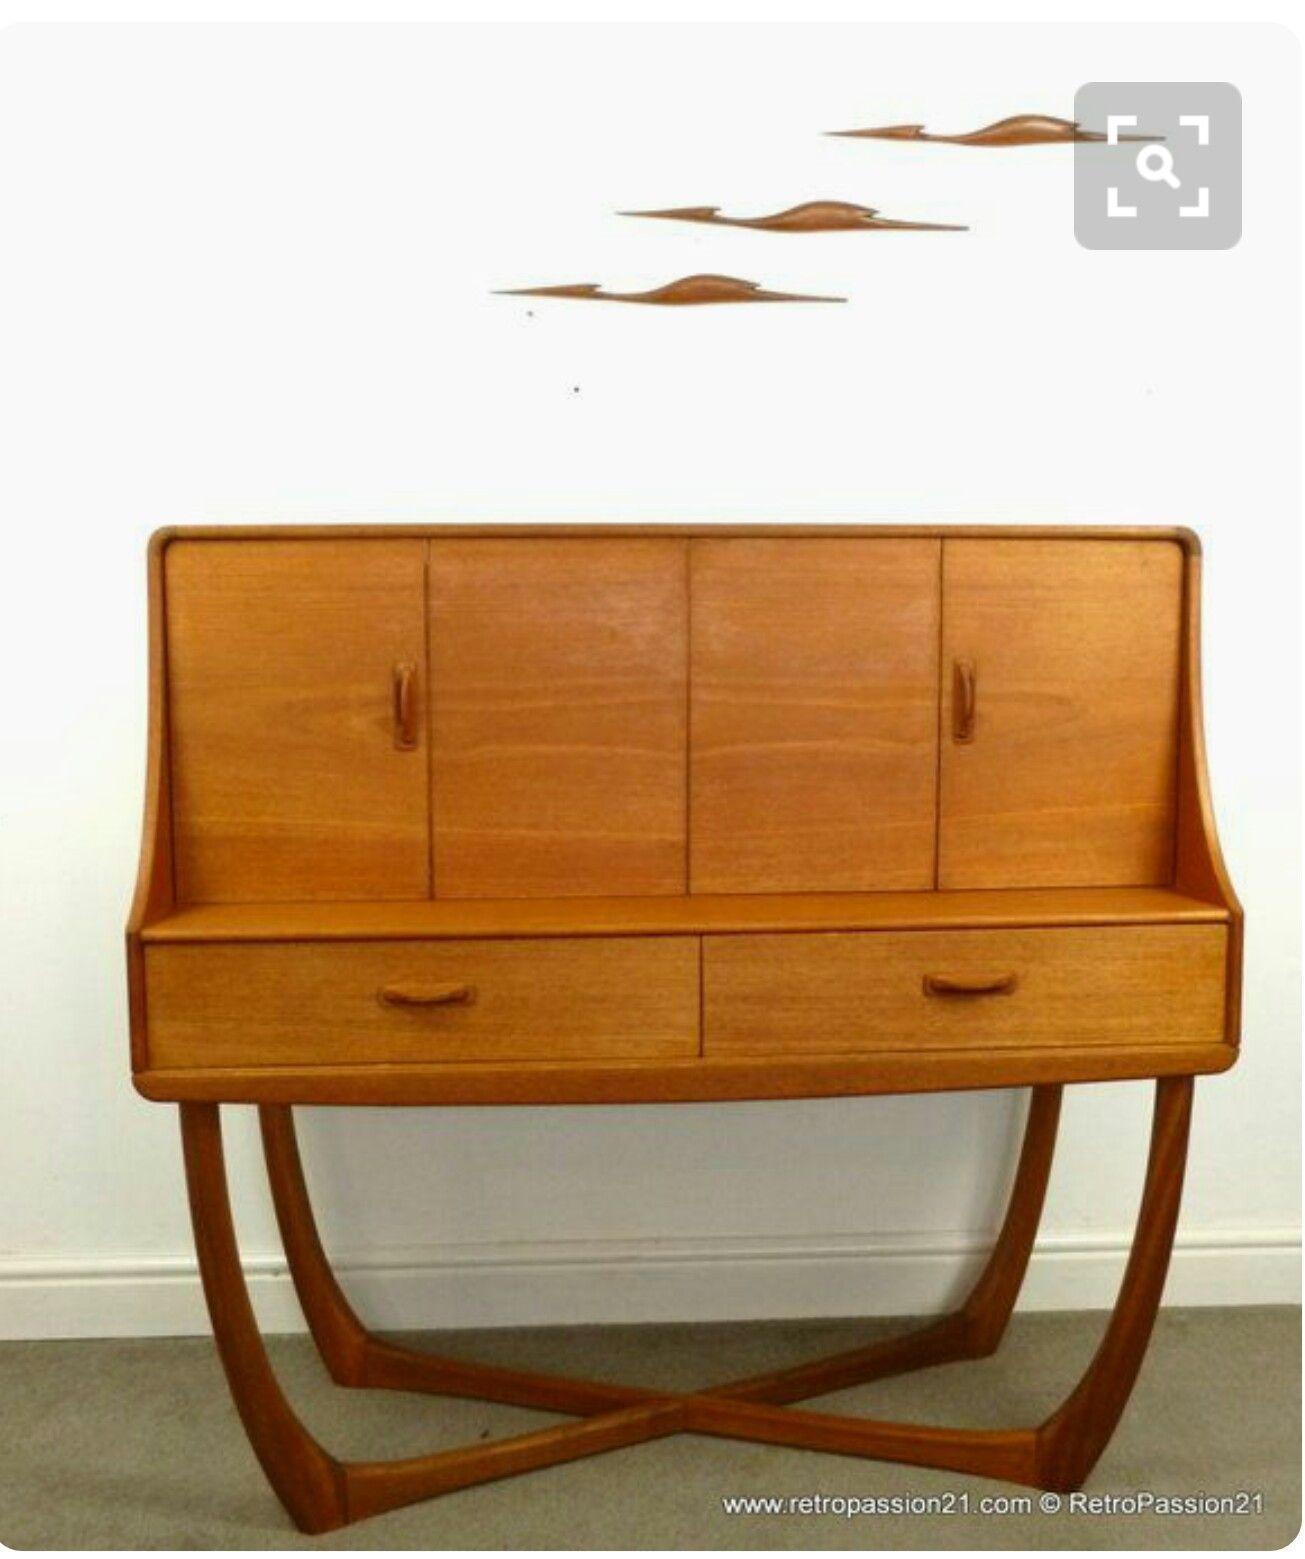 Back To Clics: Feel The Best Lighting Design! | Mid century ... Danish Modern Furniture Credenza on vintage danish modern furniture, danish modern dining chairs, danish modern bedroom furniture, vintage danish teak furniture,